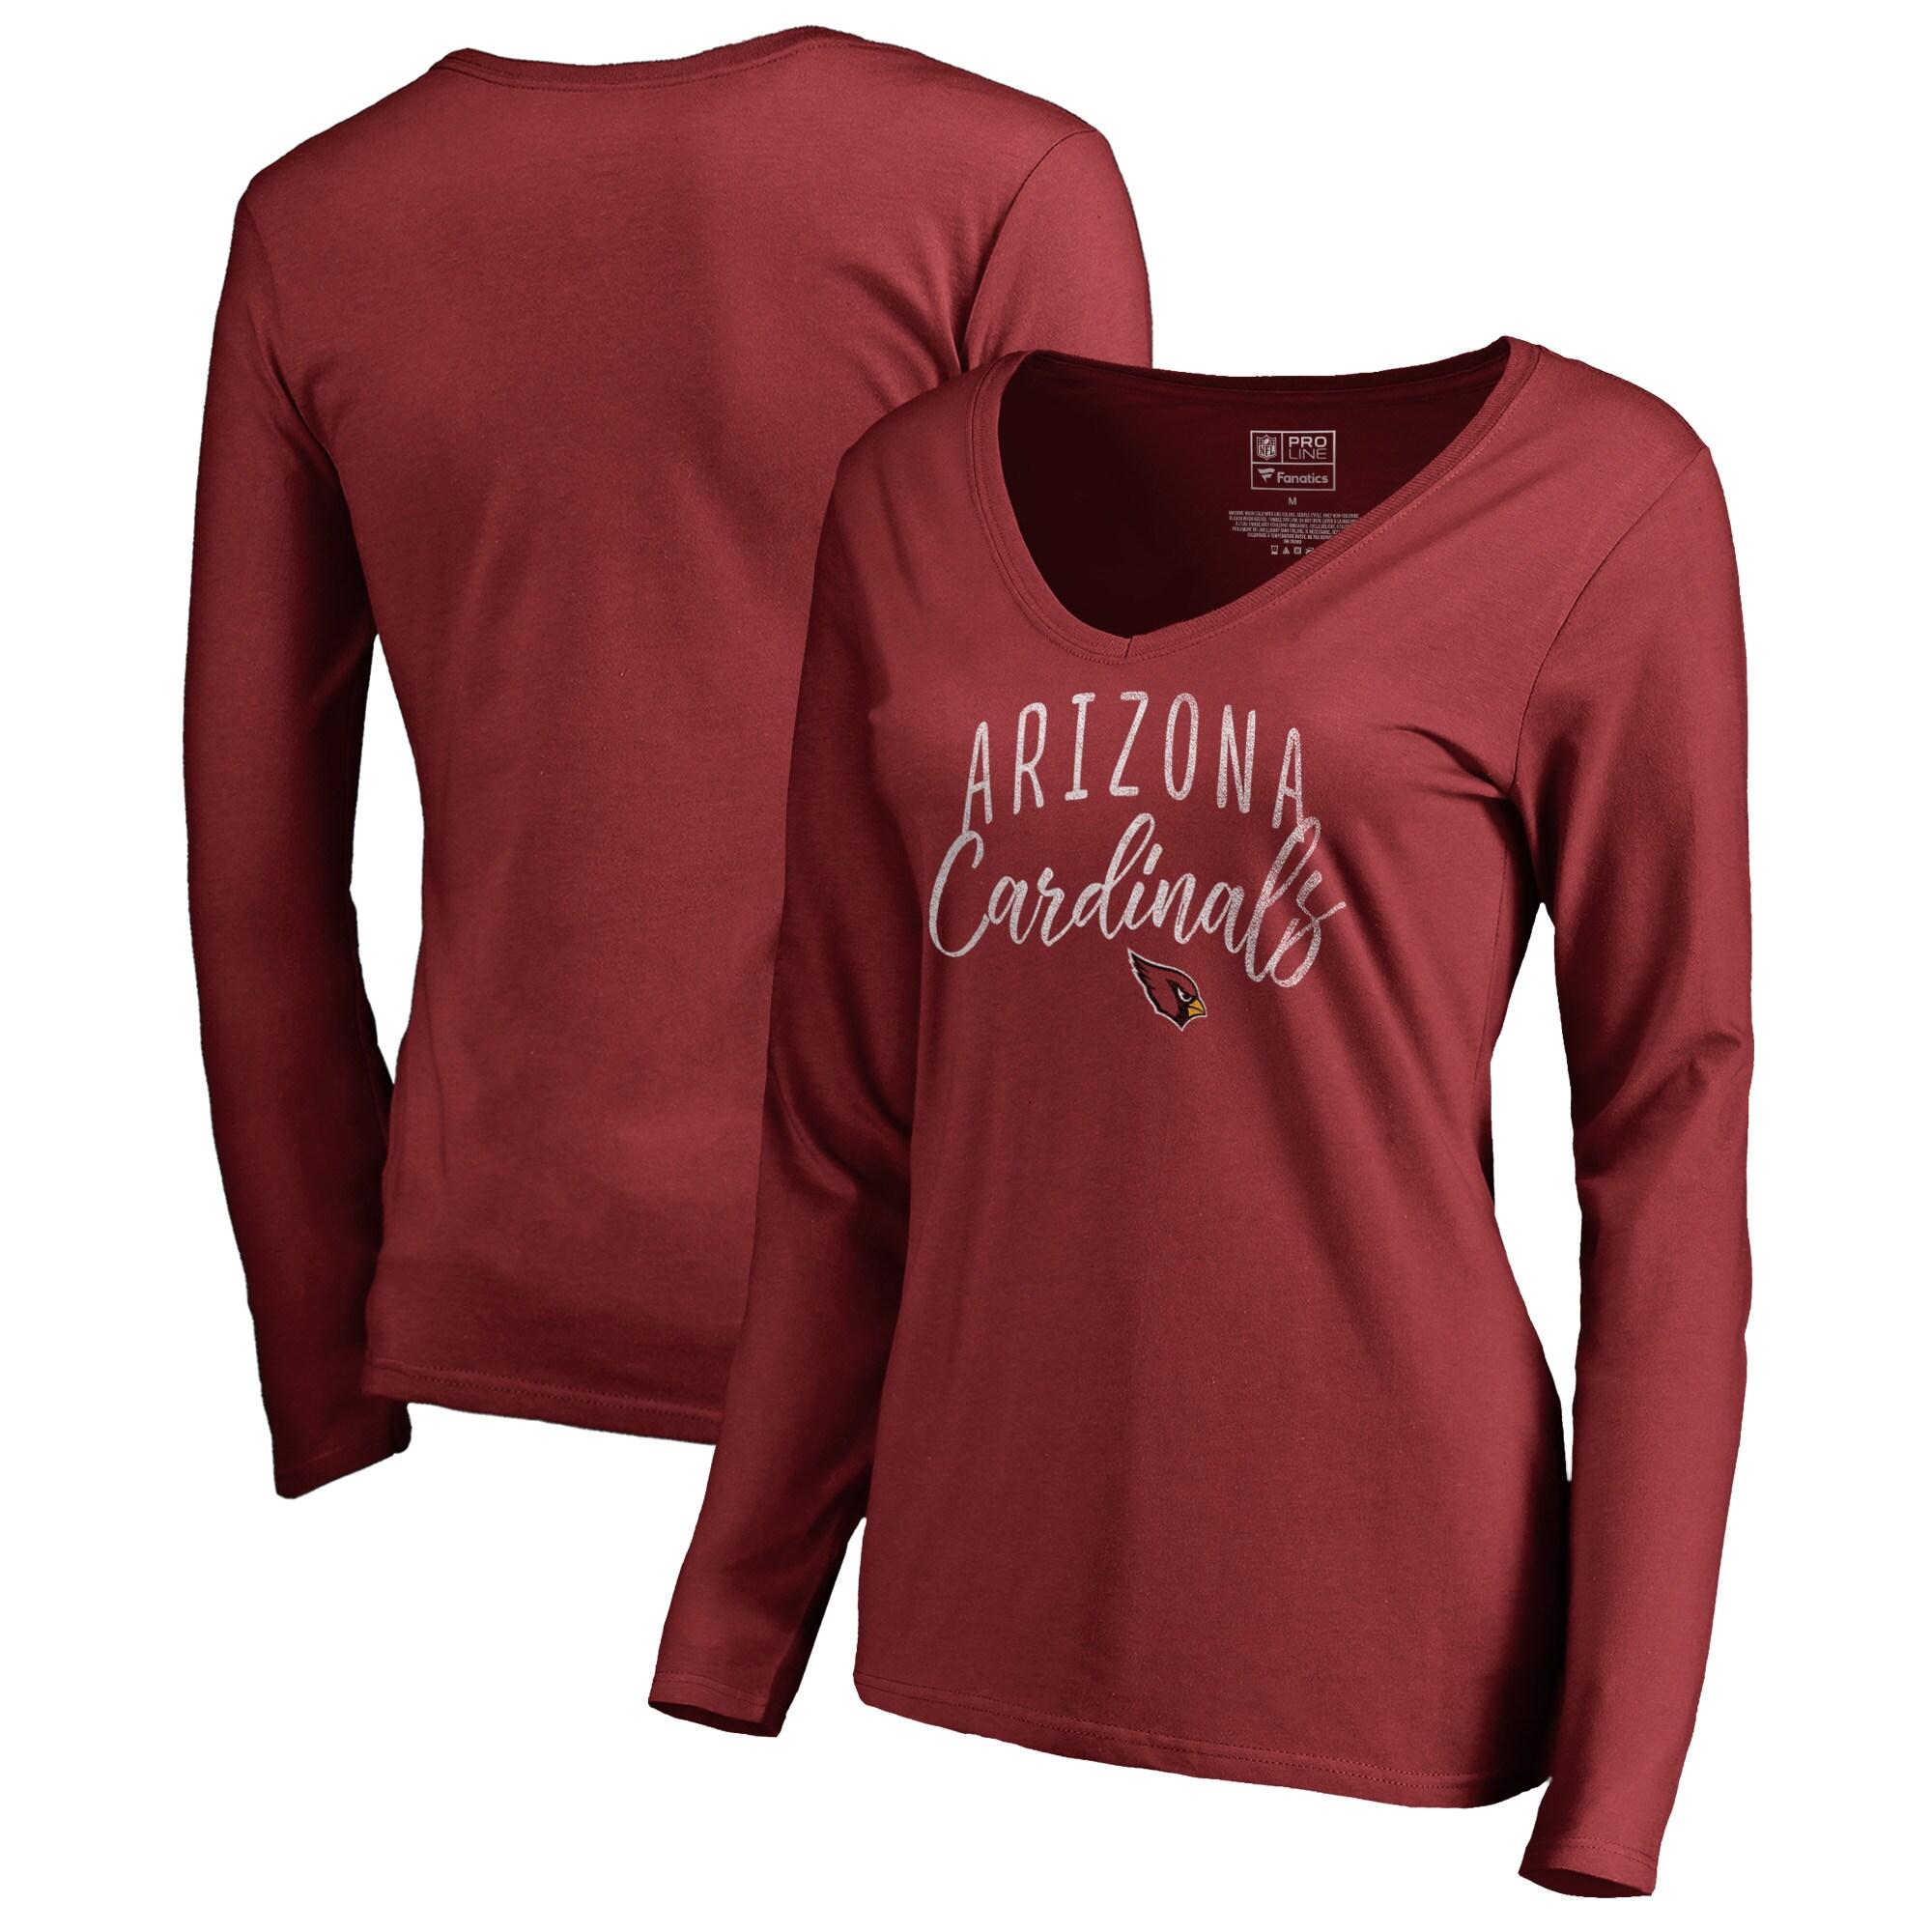 Arizona Cardinals NFL Pro Line by Fanatics Branded Women's Graceful Long Sleeve V-Neck T-Shirt - Cardinal